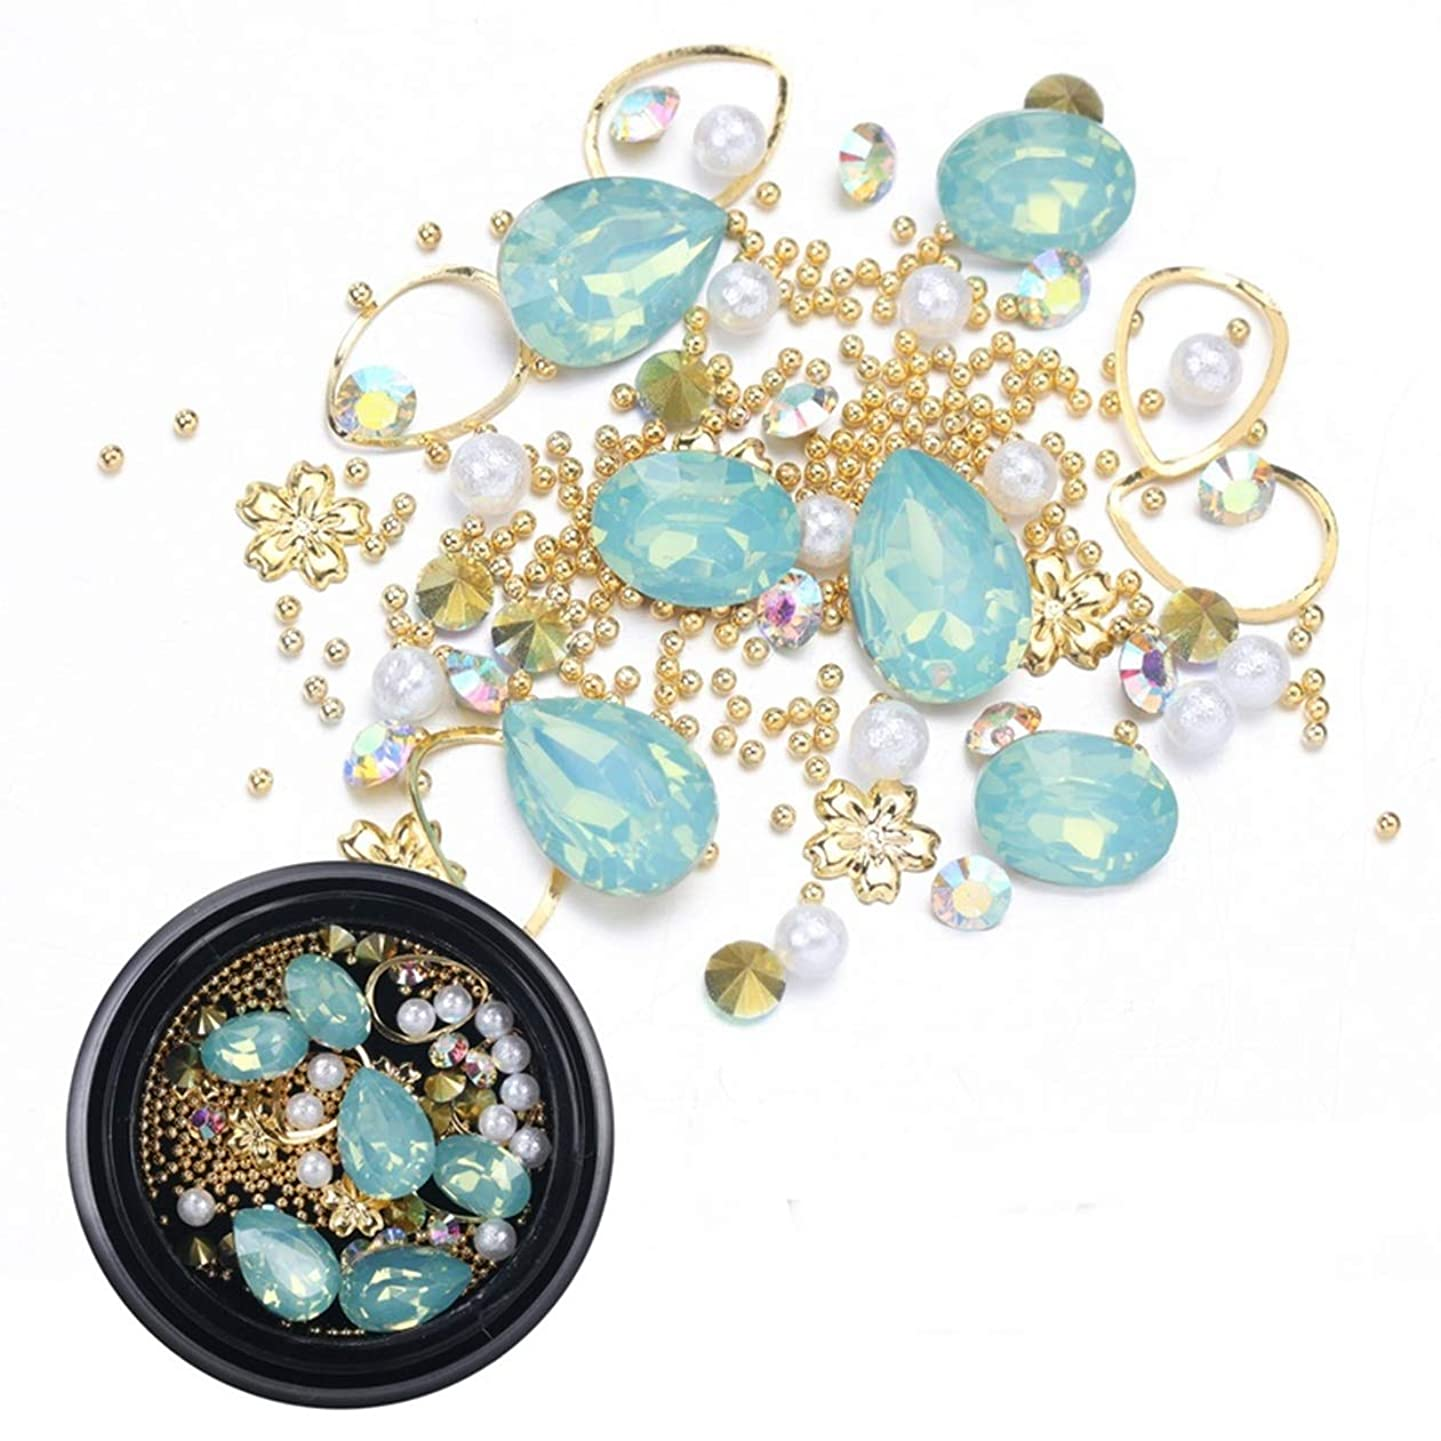 1 Pcs Mixed Shape Opal Resin Studs Nails Art Rhinestone Dazzling Popular Nail Crystals Stones Kit Paint Pen Brush Stickers Decals Tool DIY Foil Star Christmas Decor Gel Girls Tips, Type-12